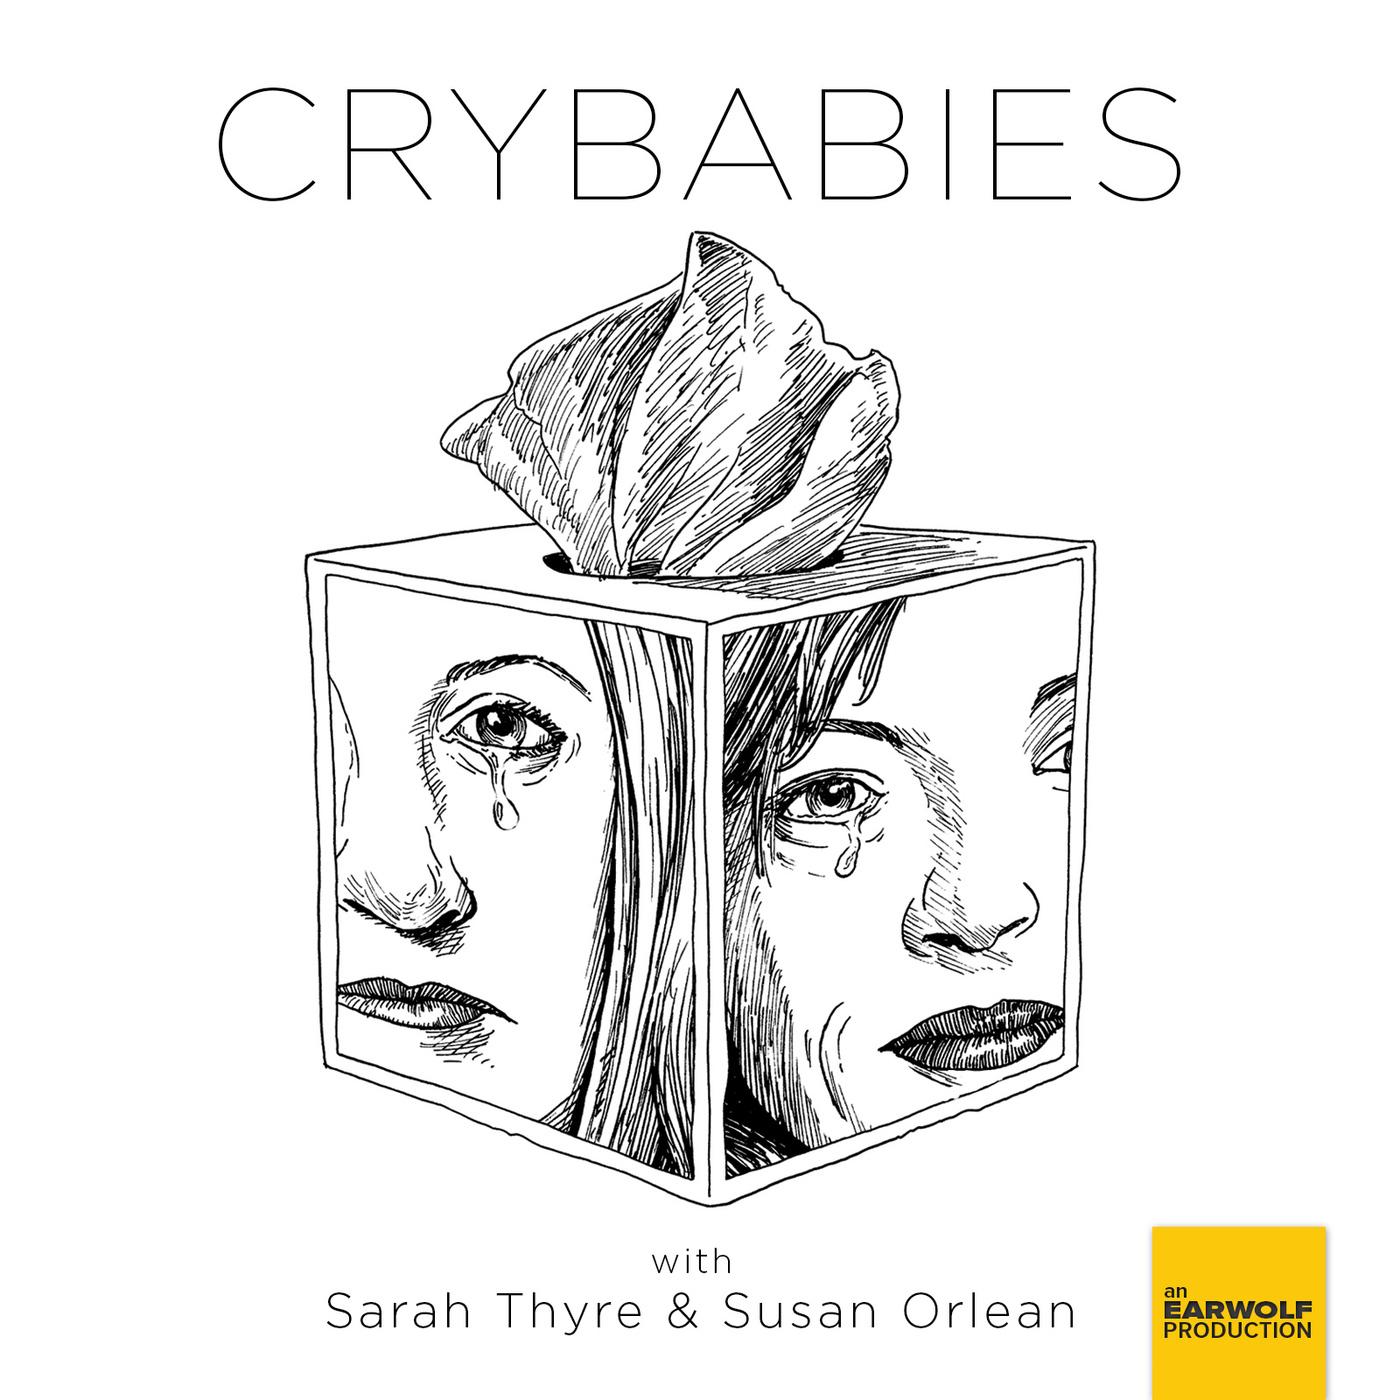 Crybabies podcast on Earwolf